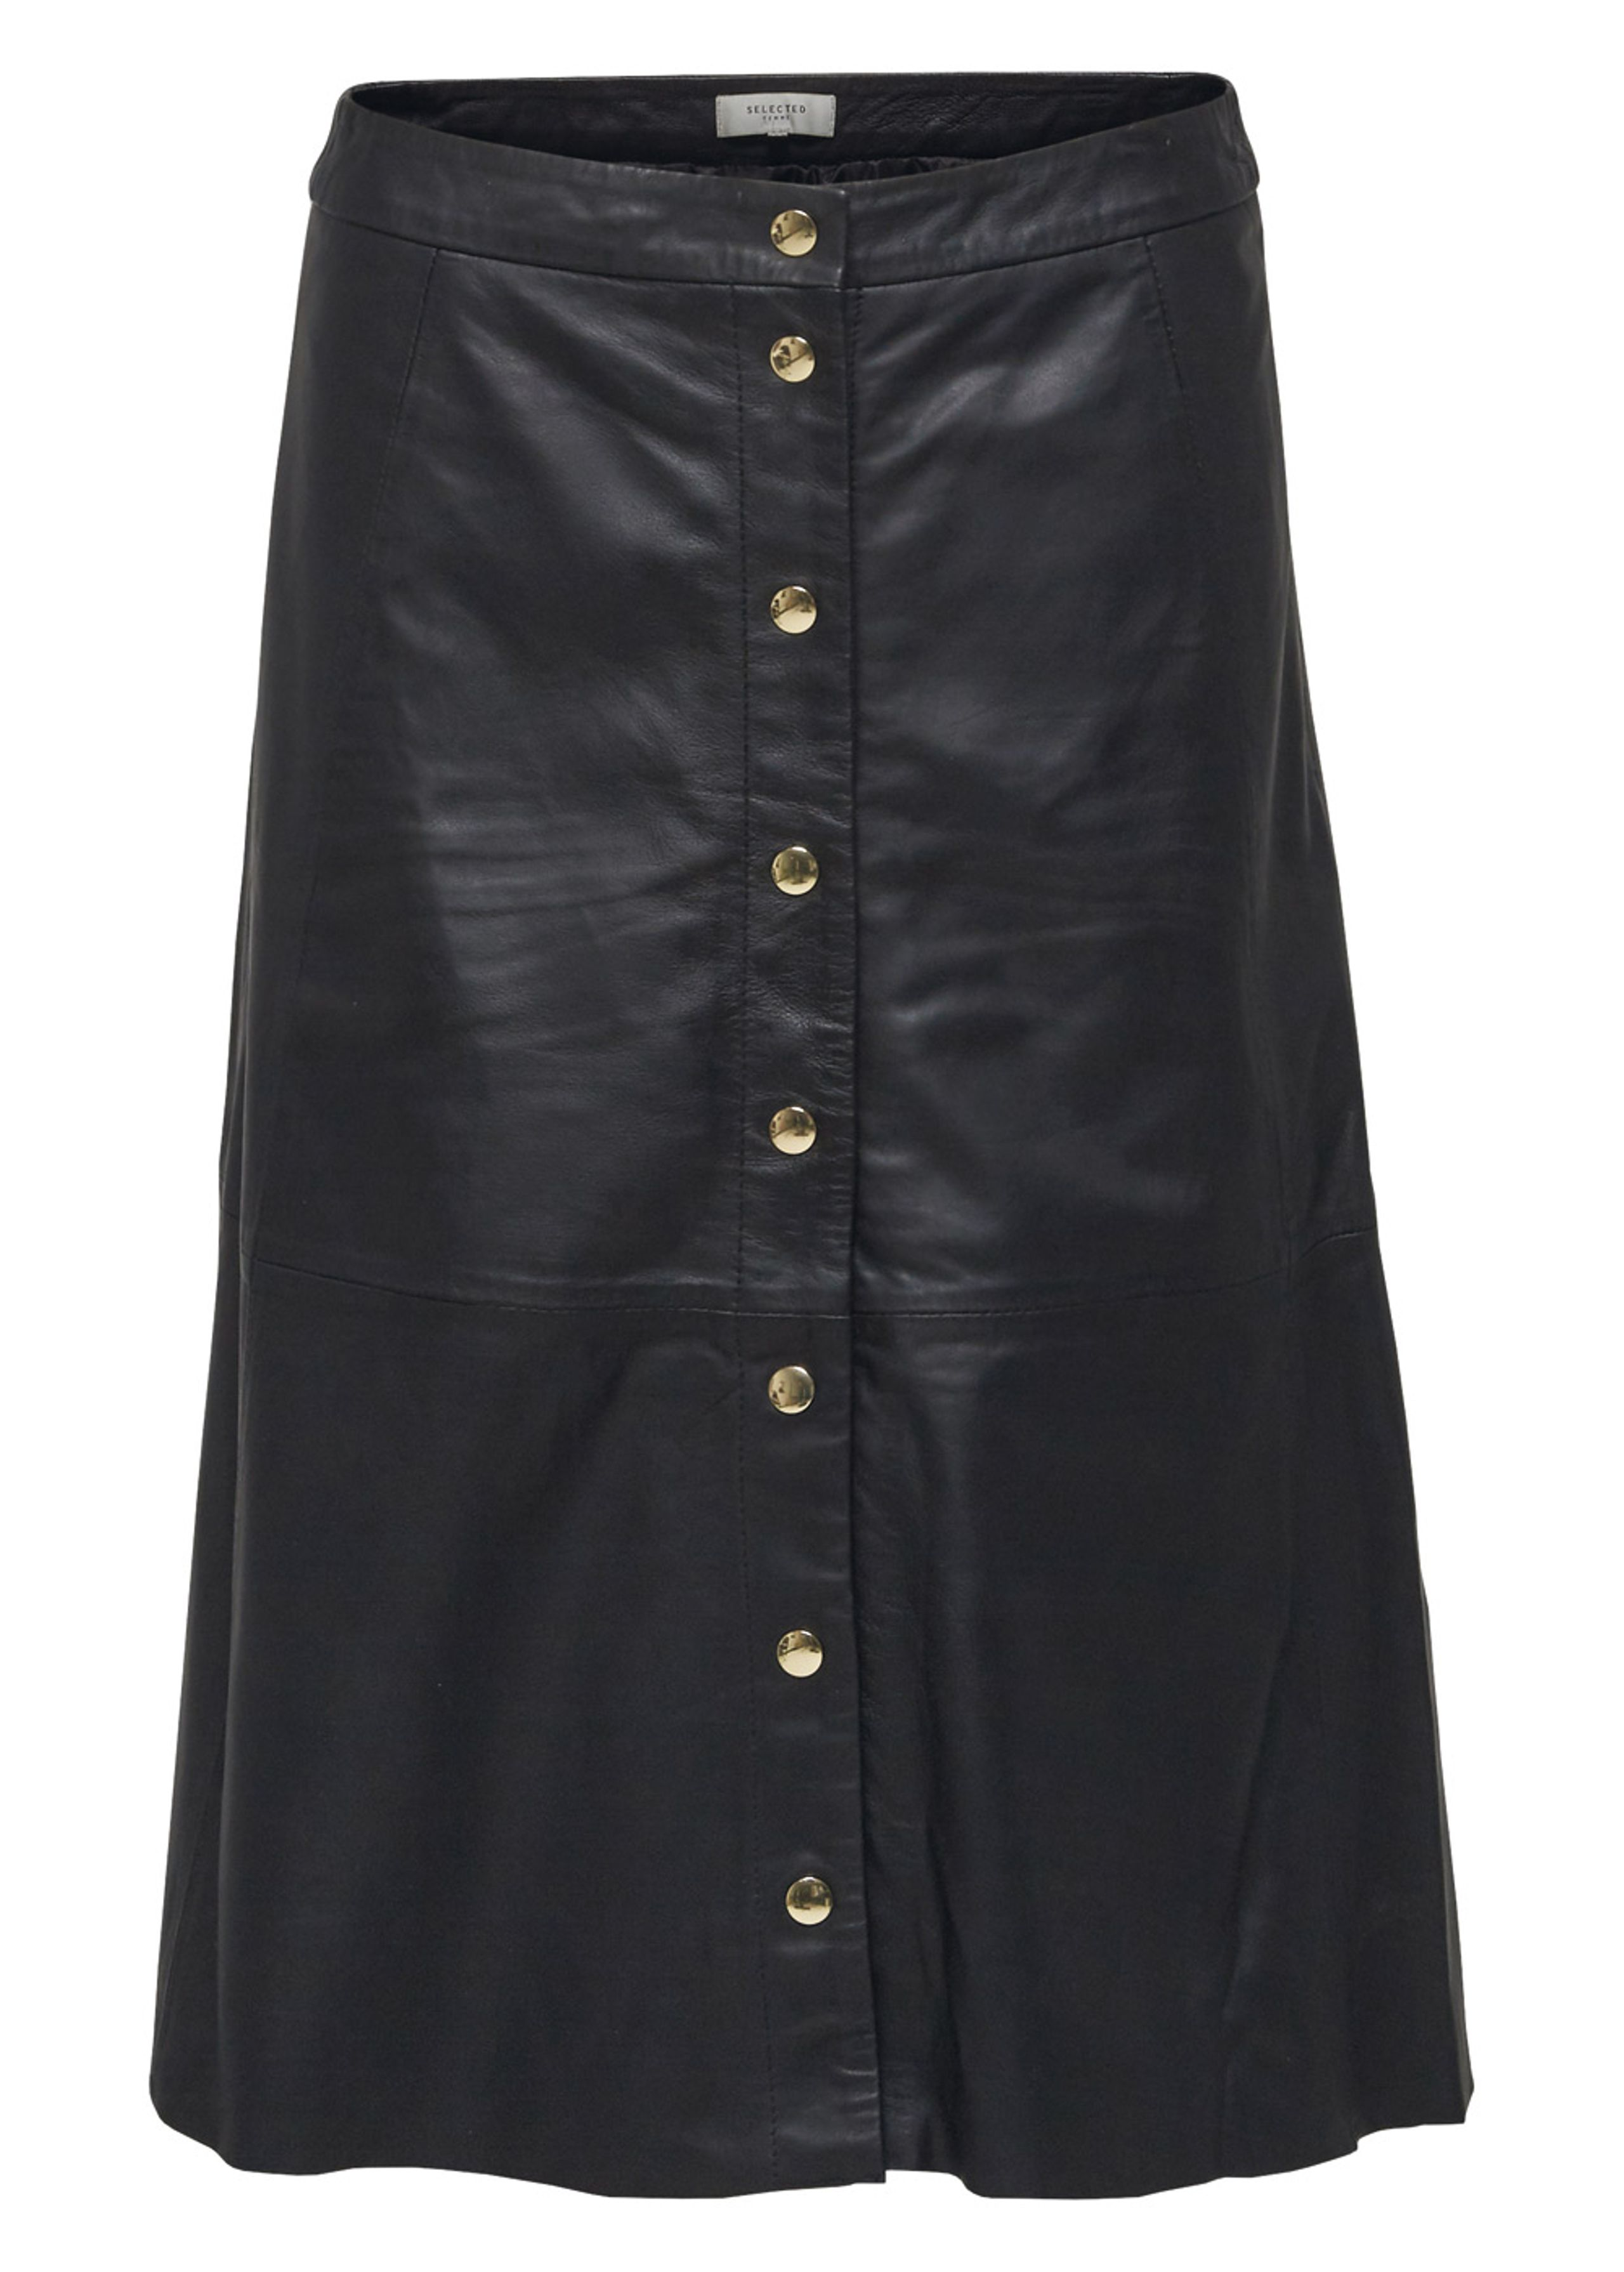 Image of   Sonja High Waist Leather Skirt